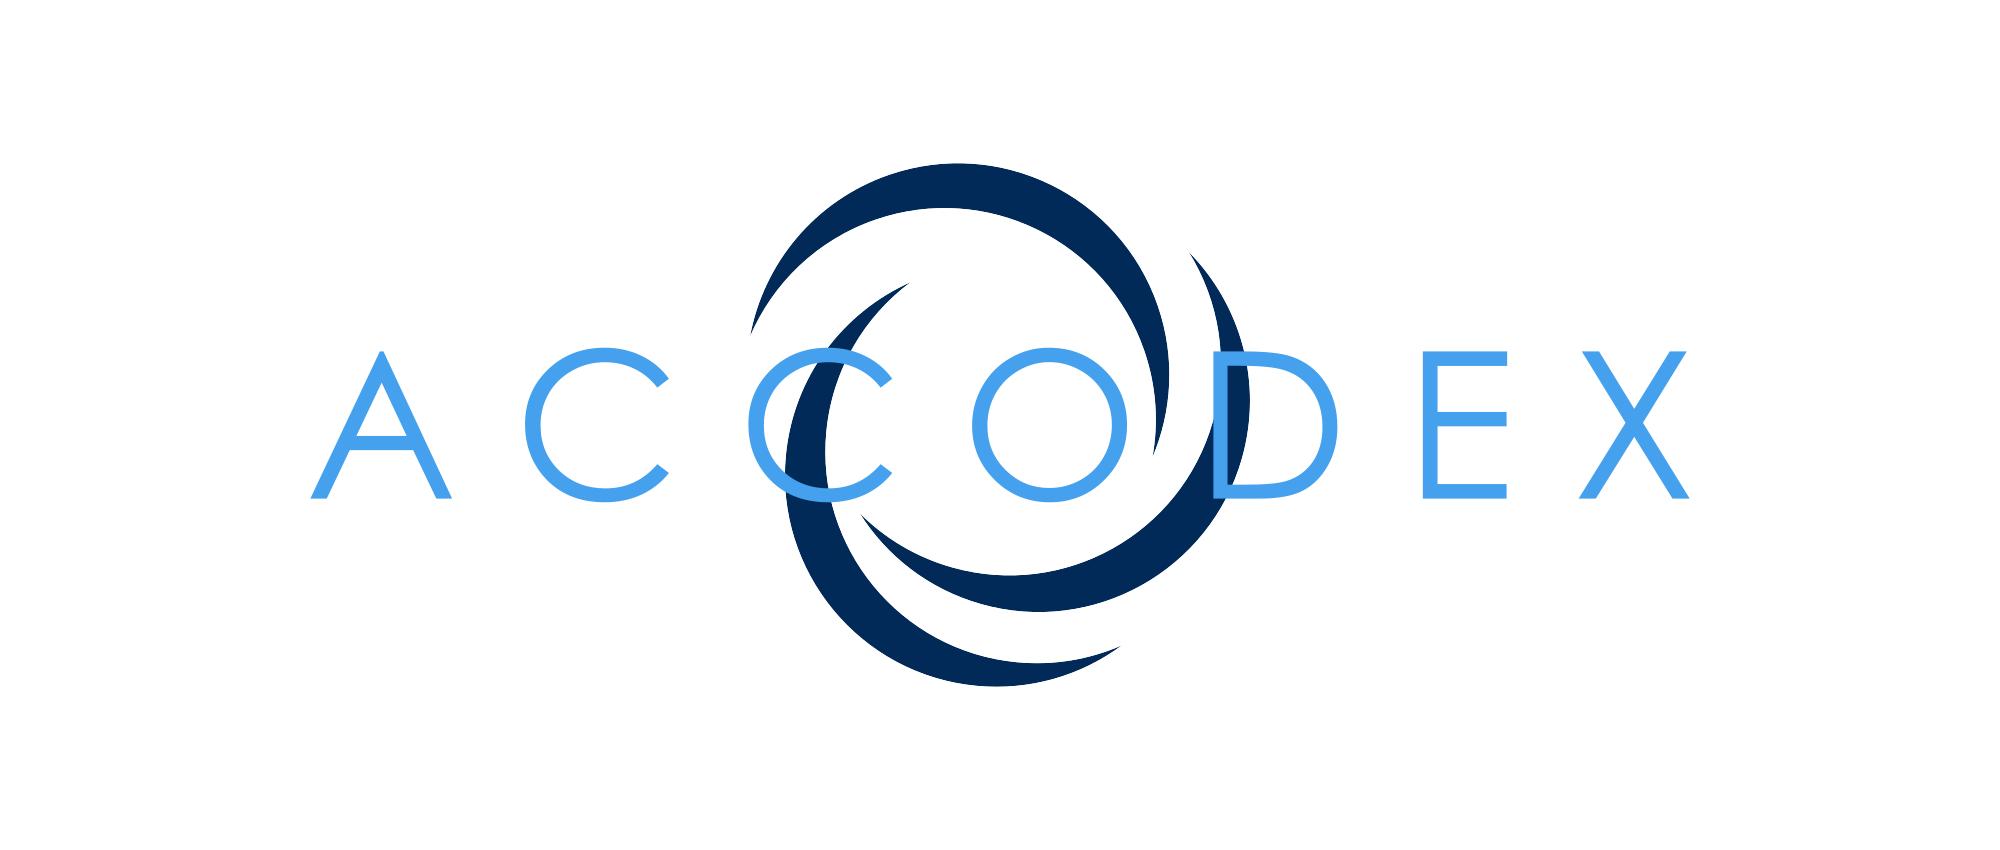 Accodex-Lone-Logo (1).png